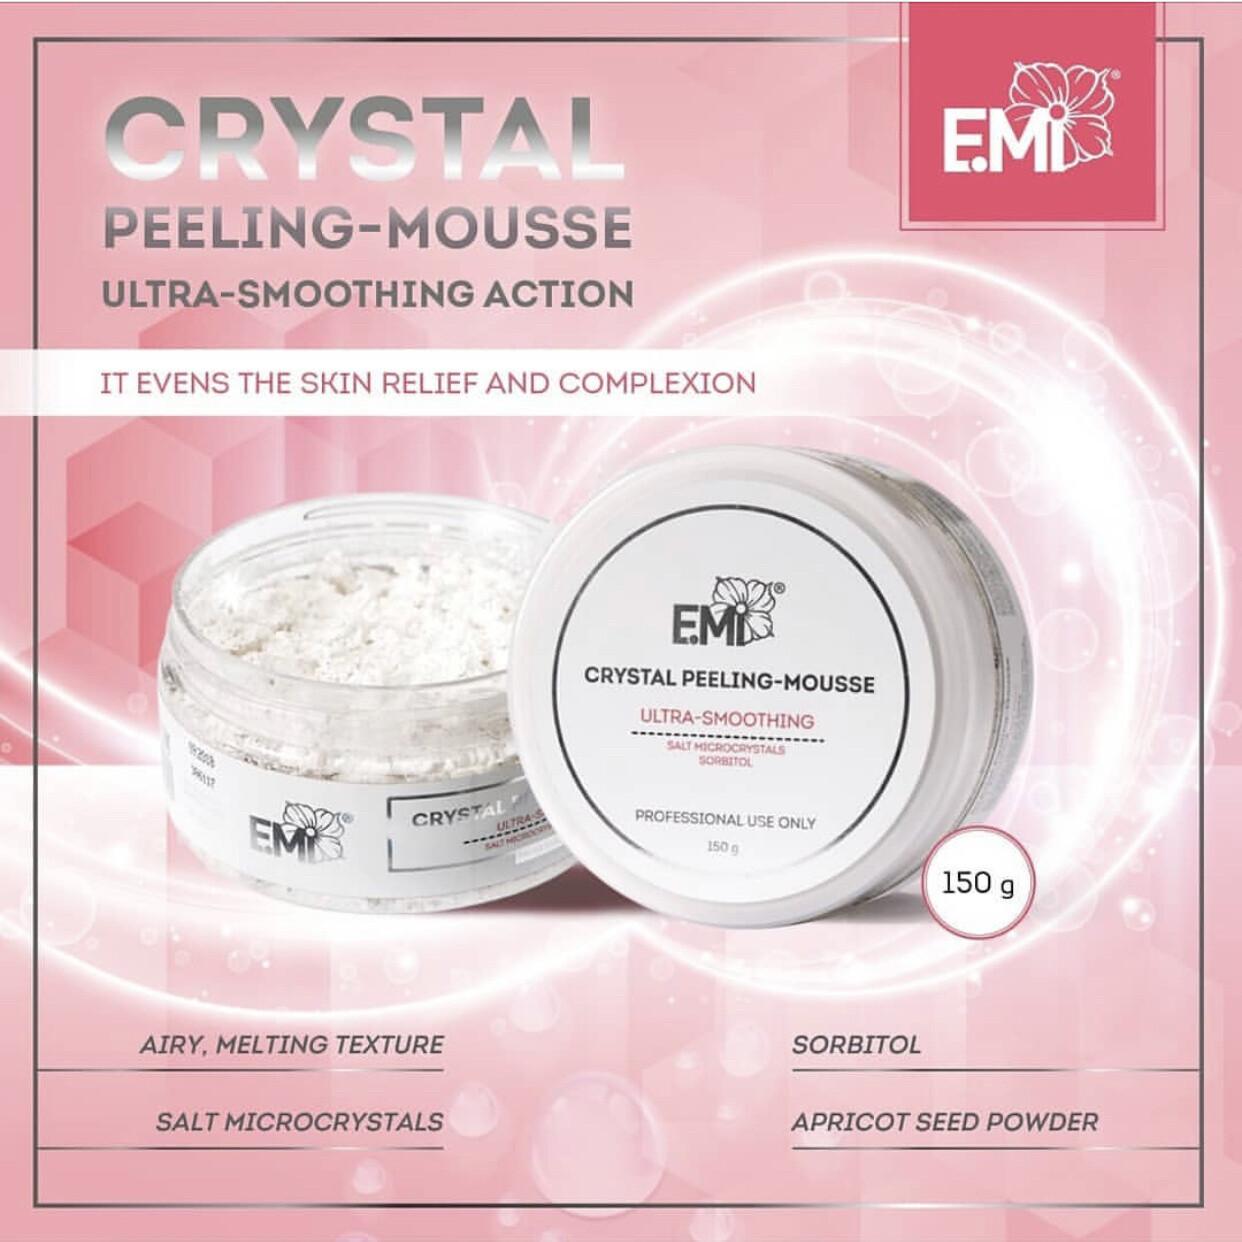 Crystal Peeling-Mousse, 150 g.